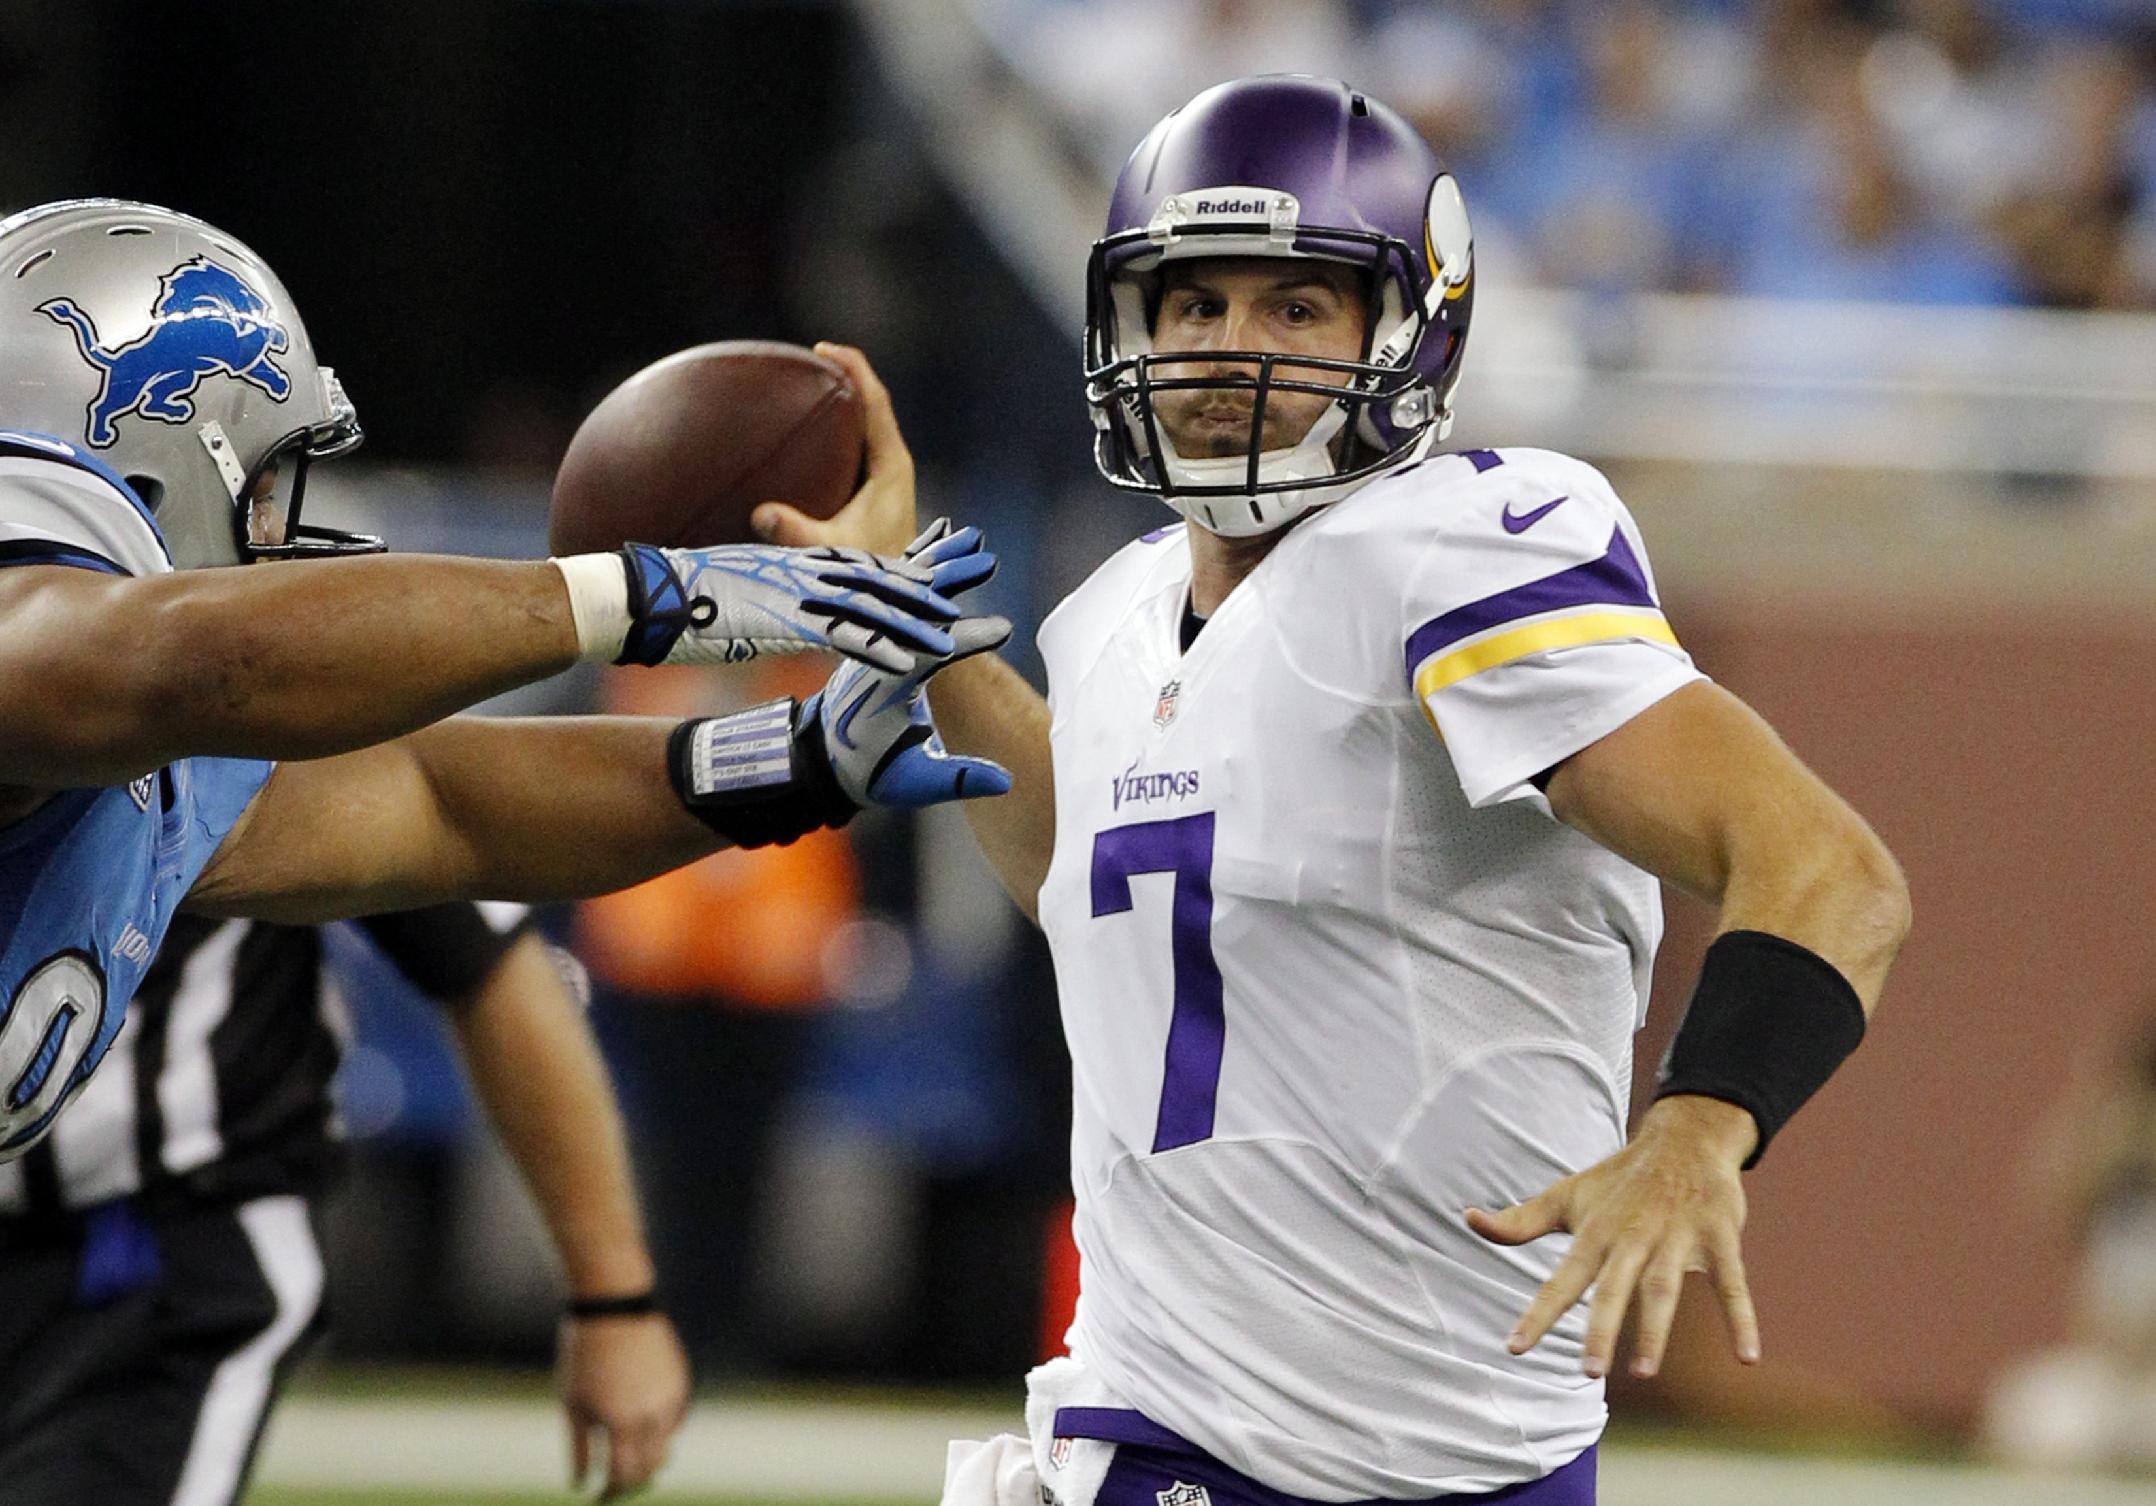 Turnover-prone Ponder must improve for Vikings